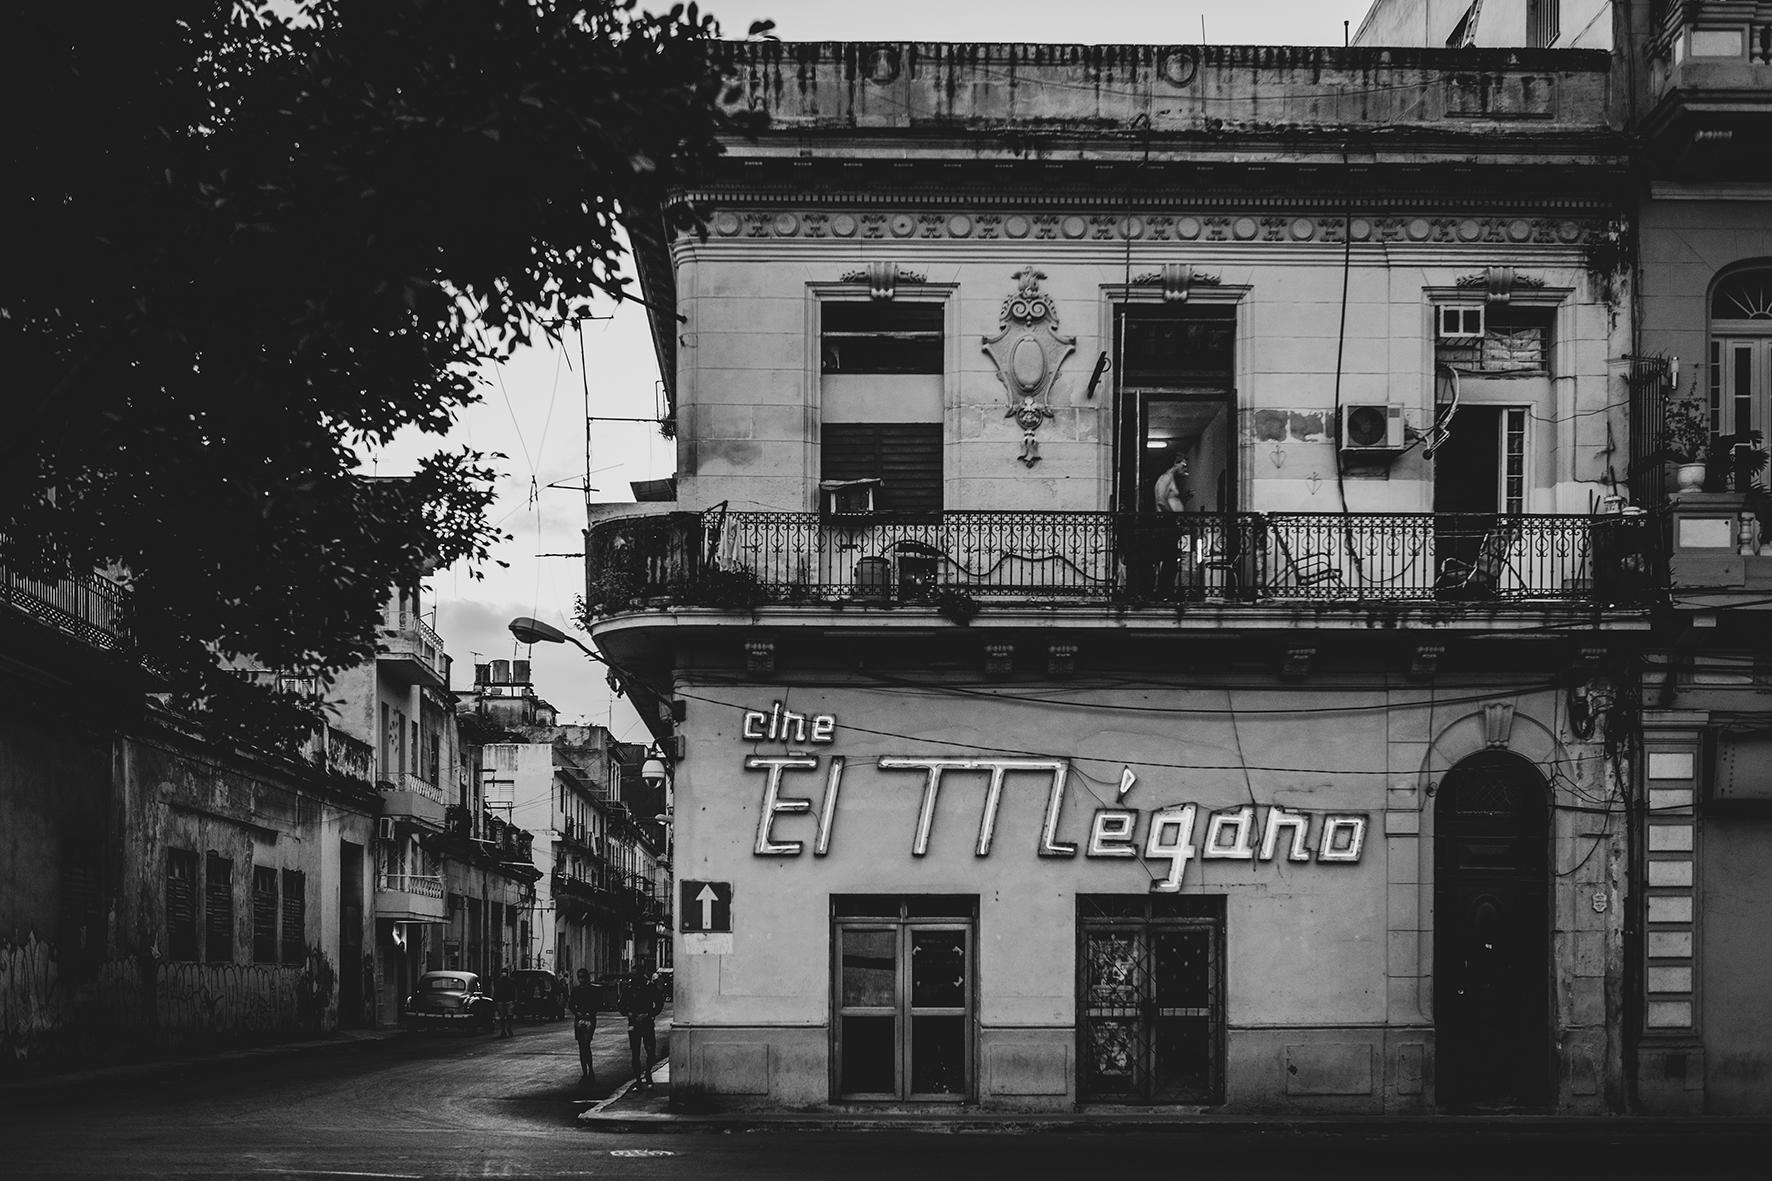 Photographe : A street show n°8